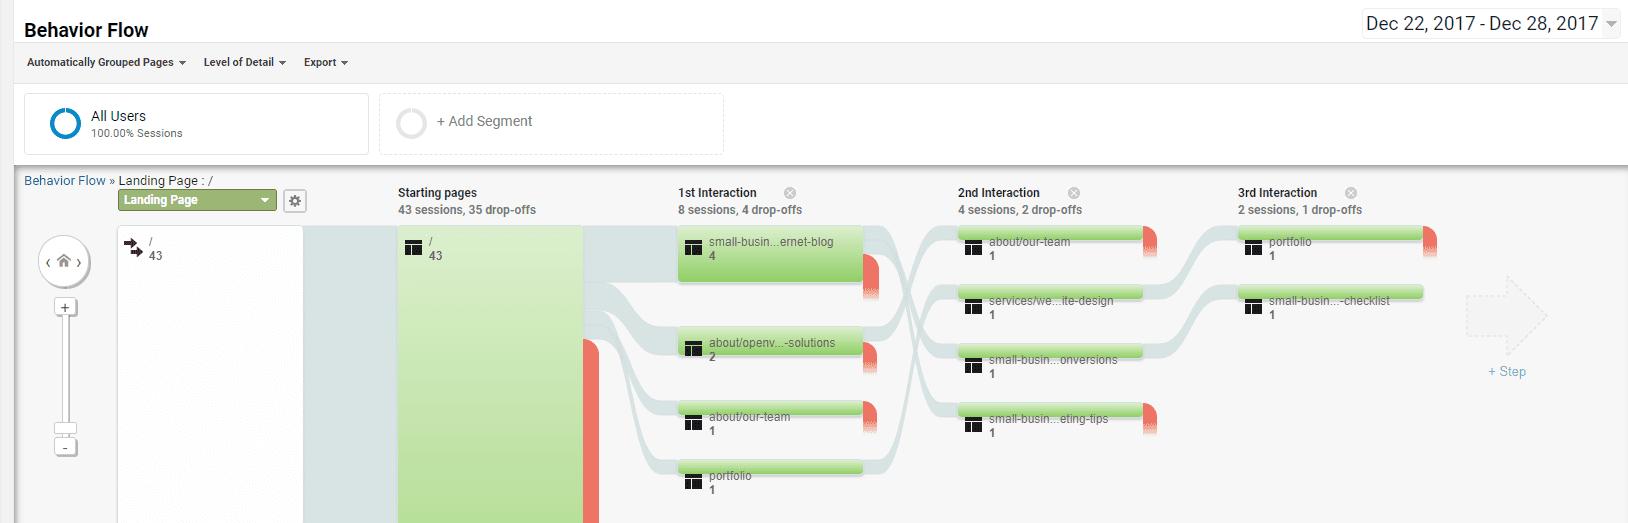 Google Analytics behavior flow